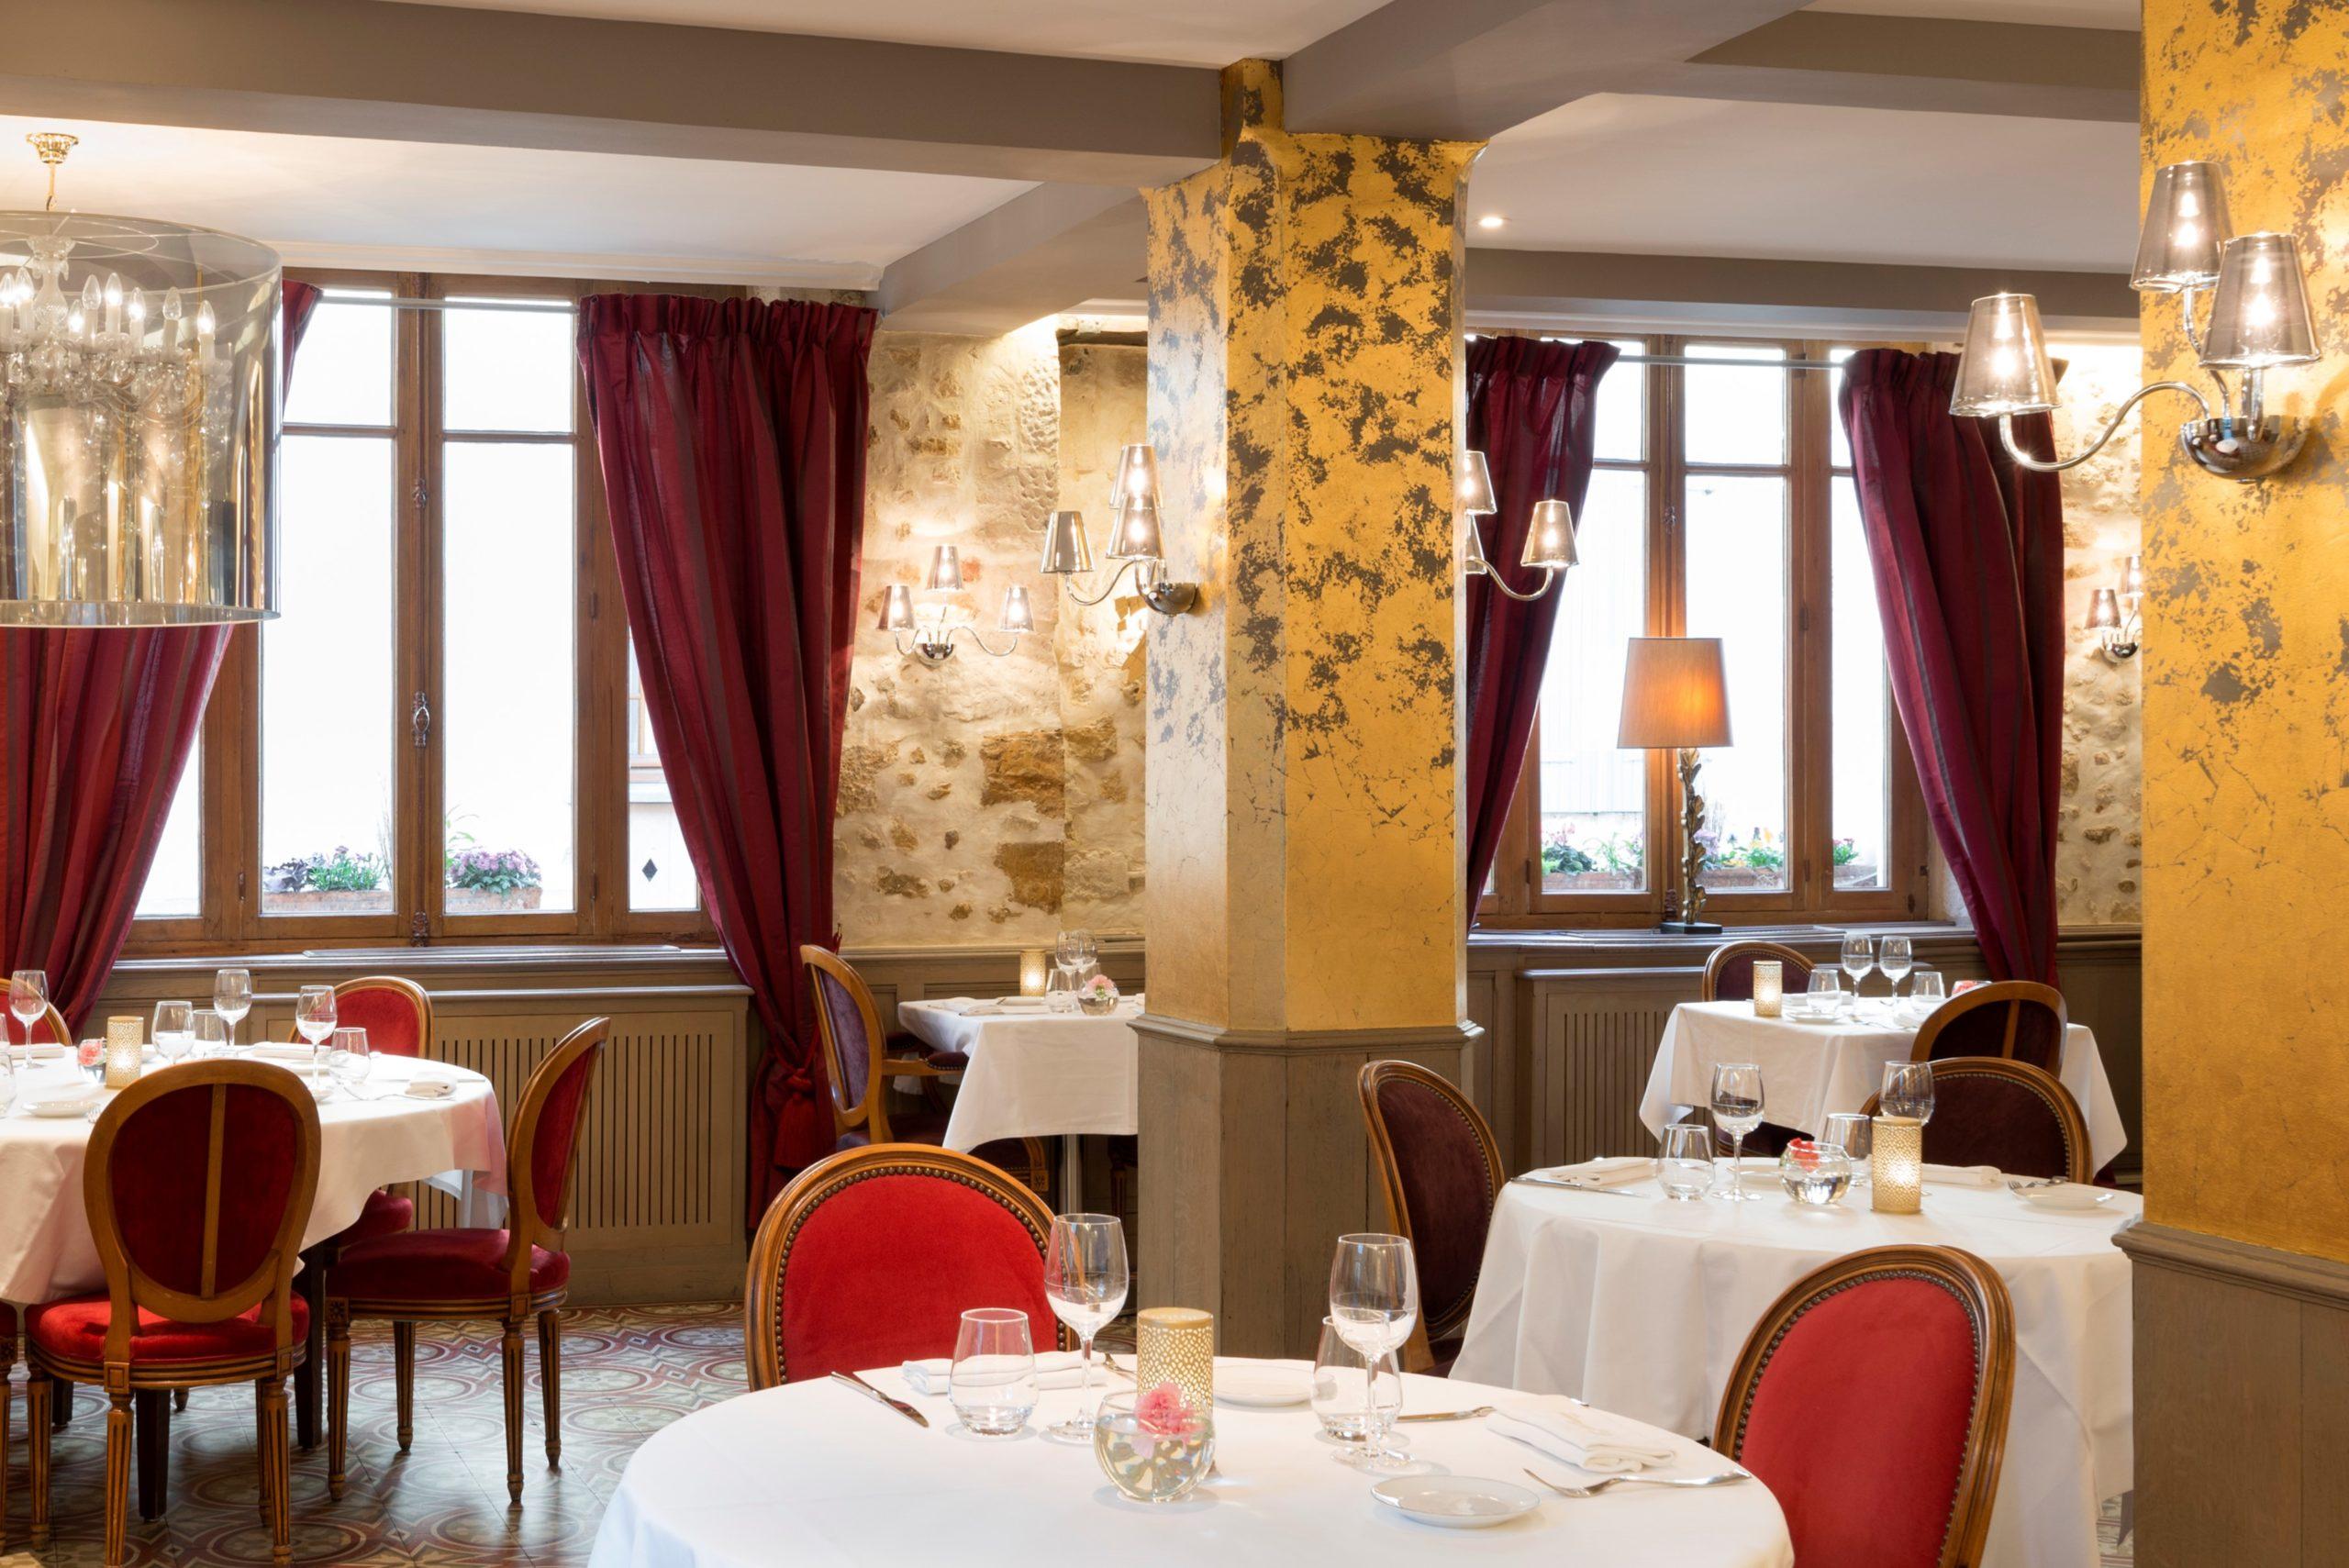 Hotel restaurant du Hotel Restaurant du Tribunal Mortagne au Perche ©Antoine Cardi